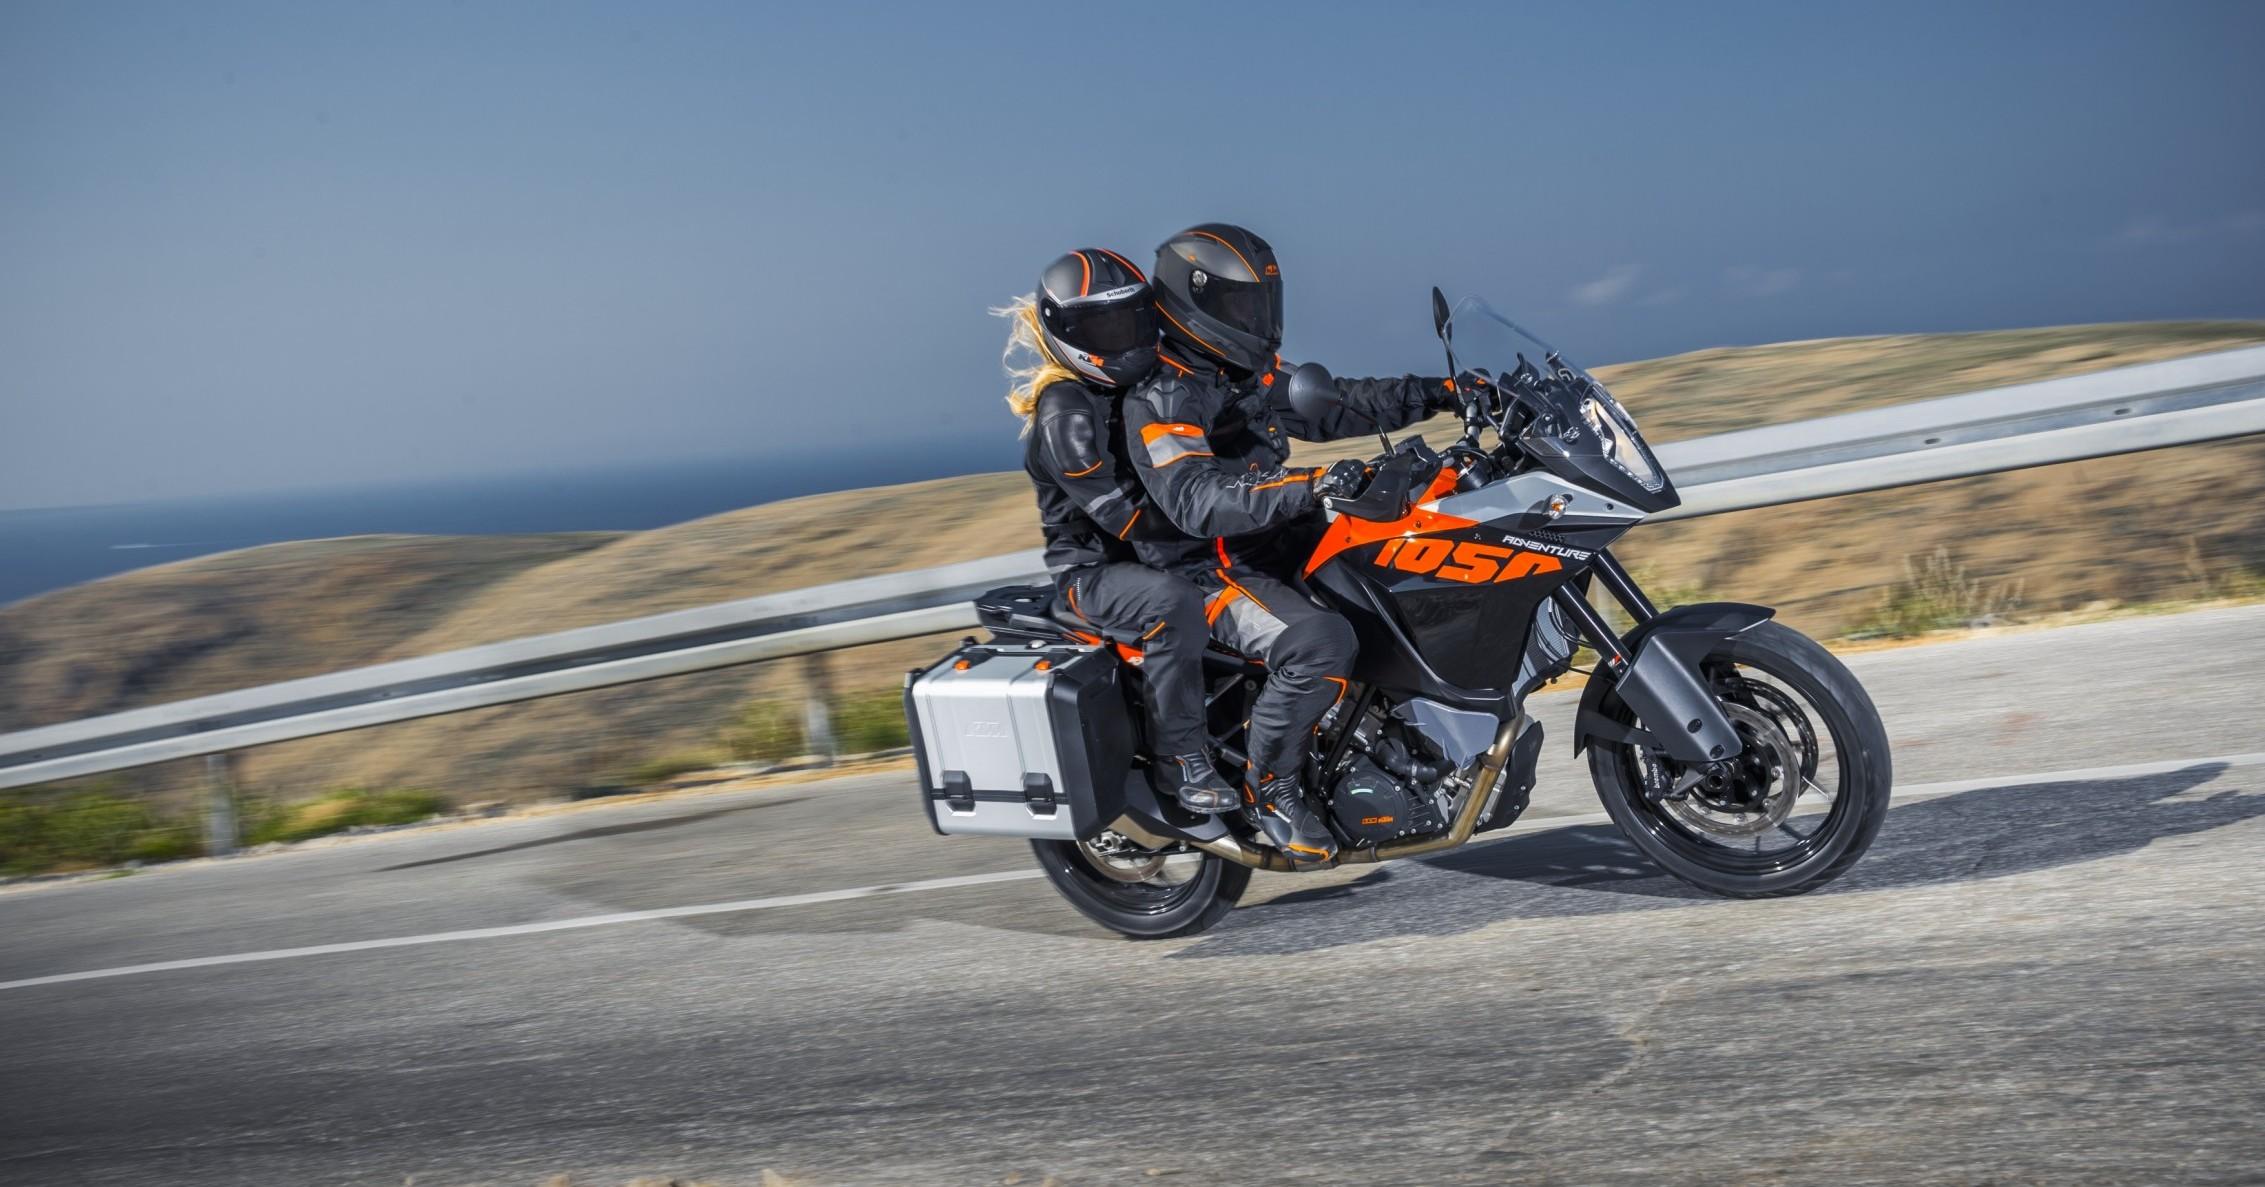 Ktm Duke 390 2017 Price >> EICMA: 2015 KTM 1050 Adventure - RevZilla